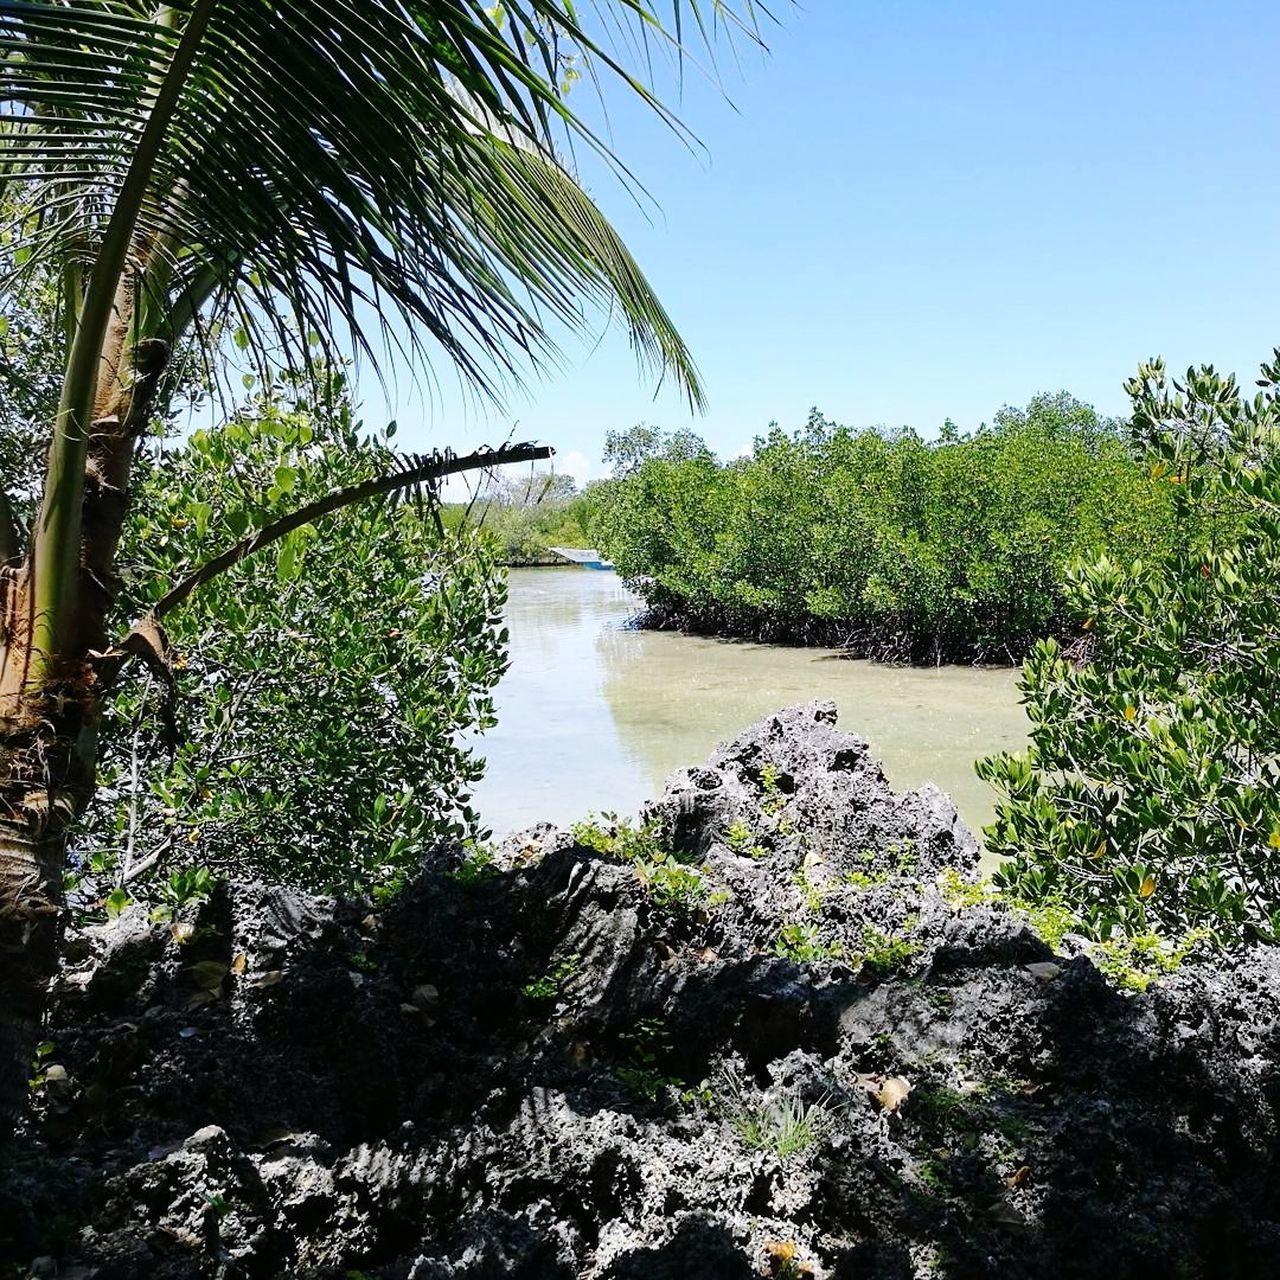 Tree Water Nature Mangroves Beauty In Nature EyeEmNewHere